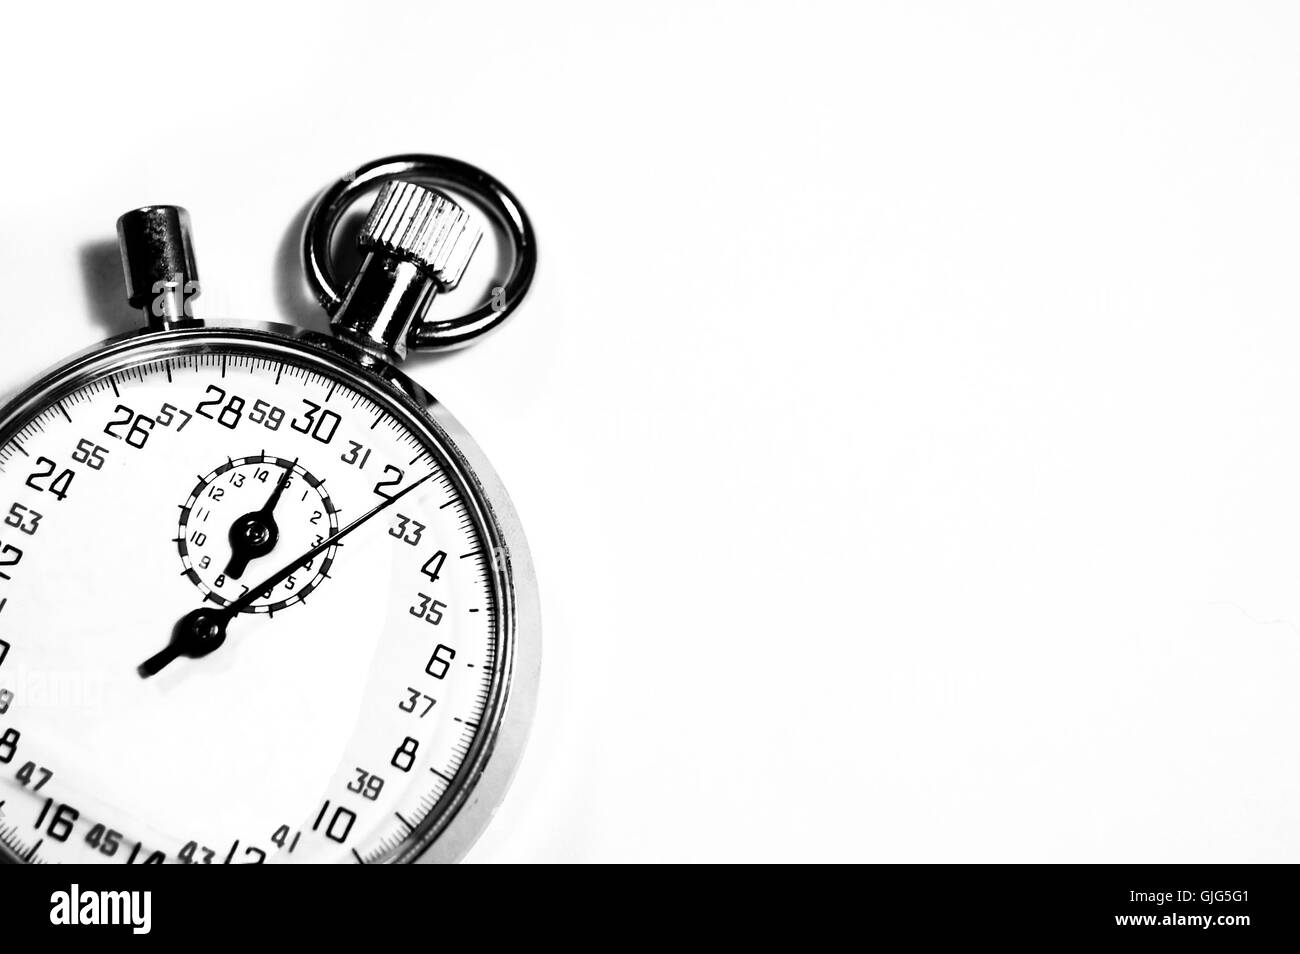 stopwatch - Stock Image